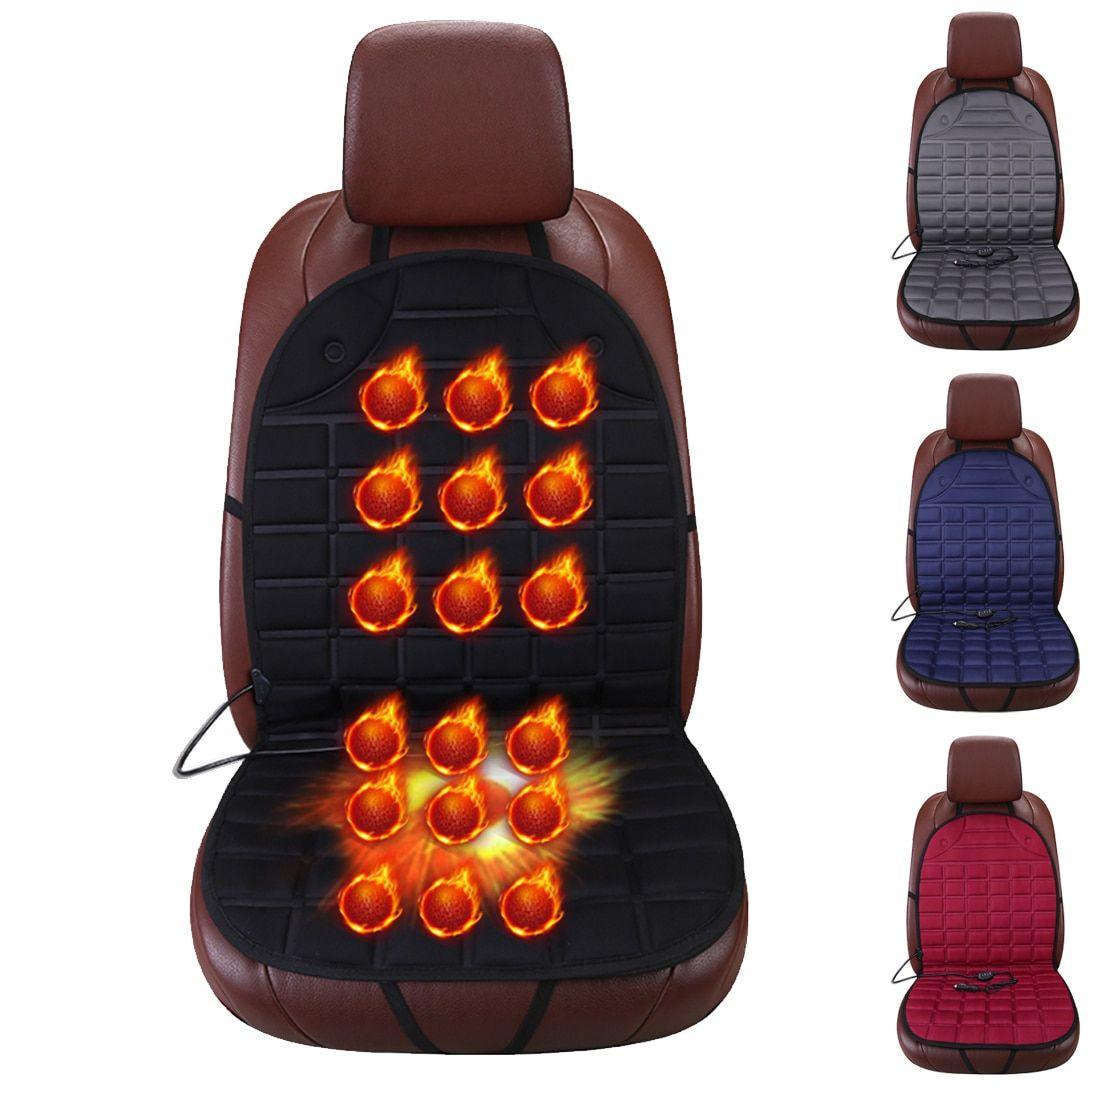 Dewtreetali 12v Seat Heated Front Car Seat Heater Warmer Winter